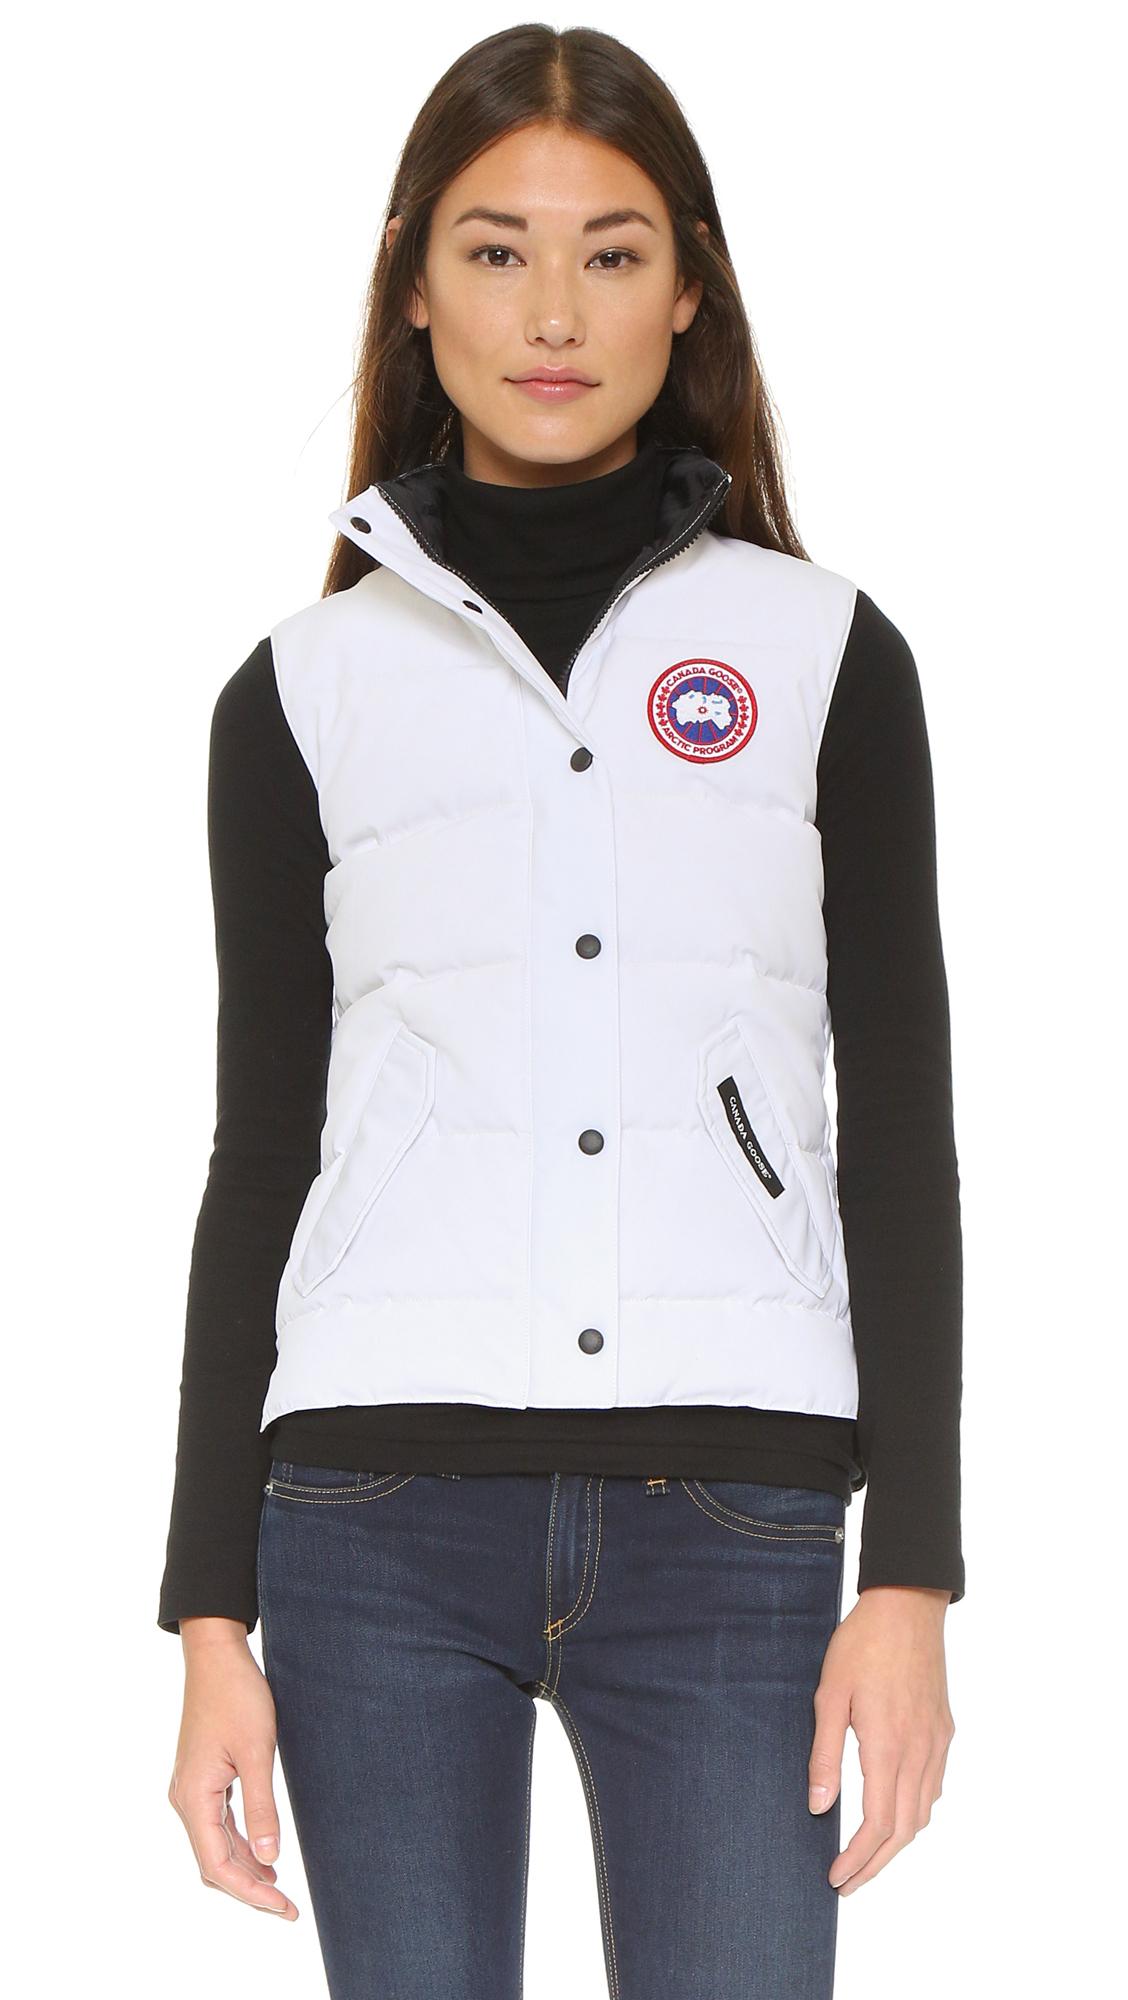 canada goose jacket vest